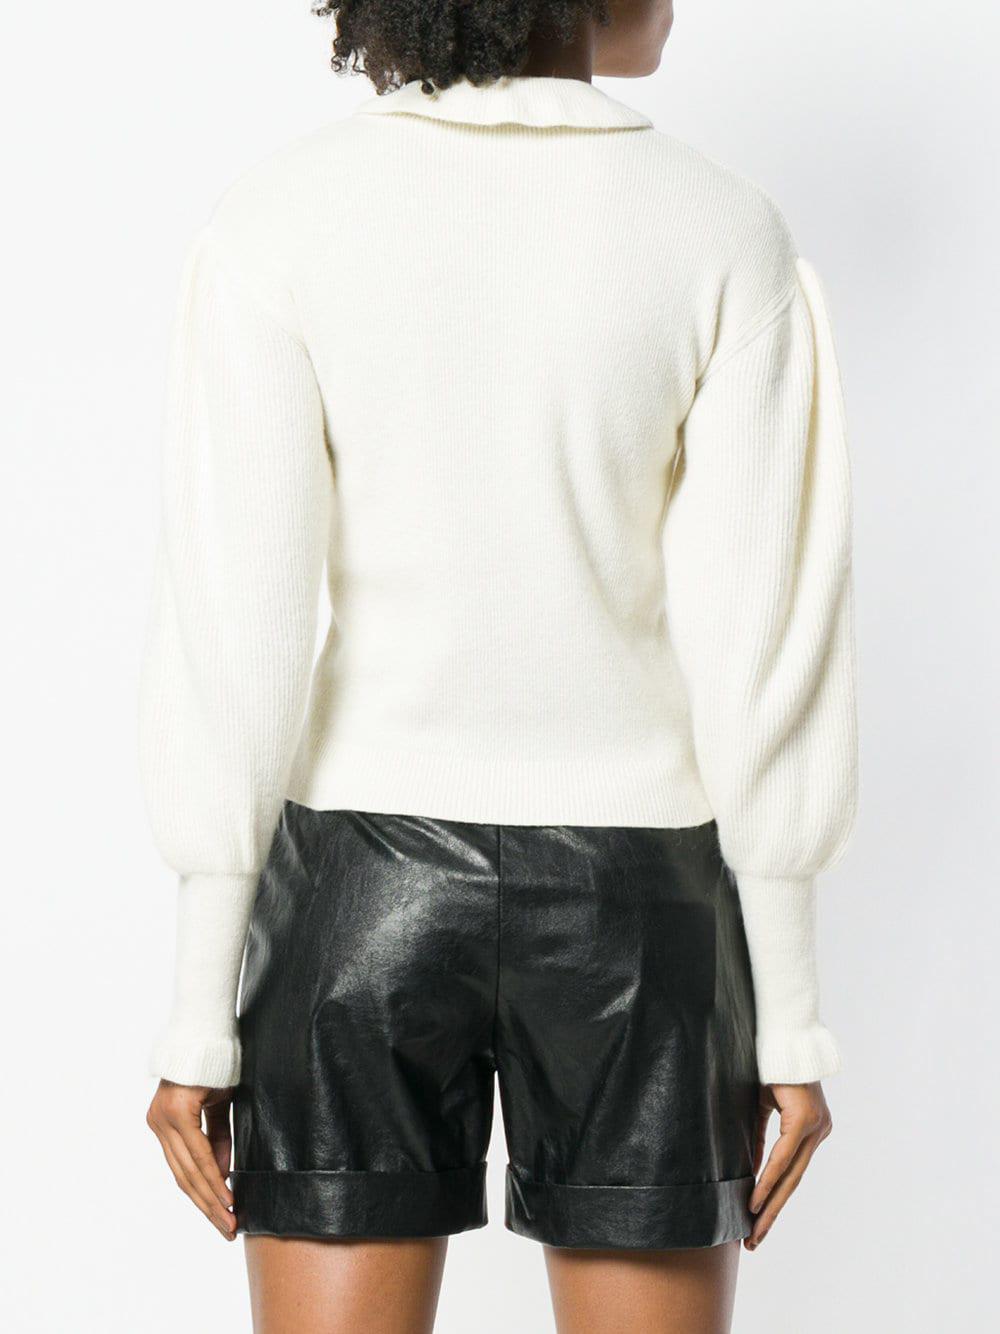 Fullscreen Lyst Philosophy Fold Di Lorenzo Serafini White View Sweater Collar 1PZ6BzqPw